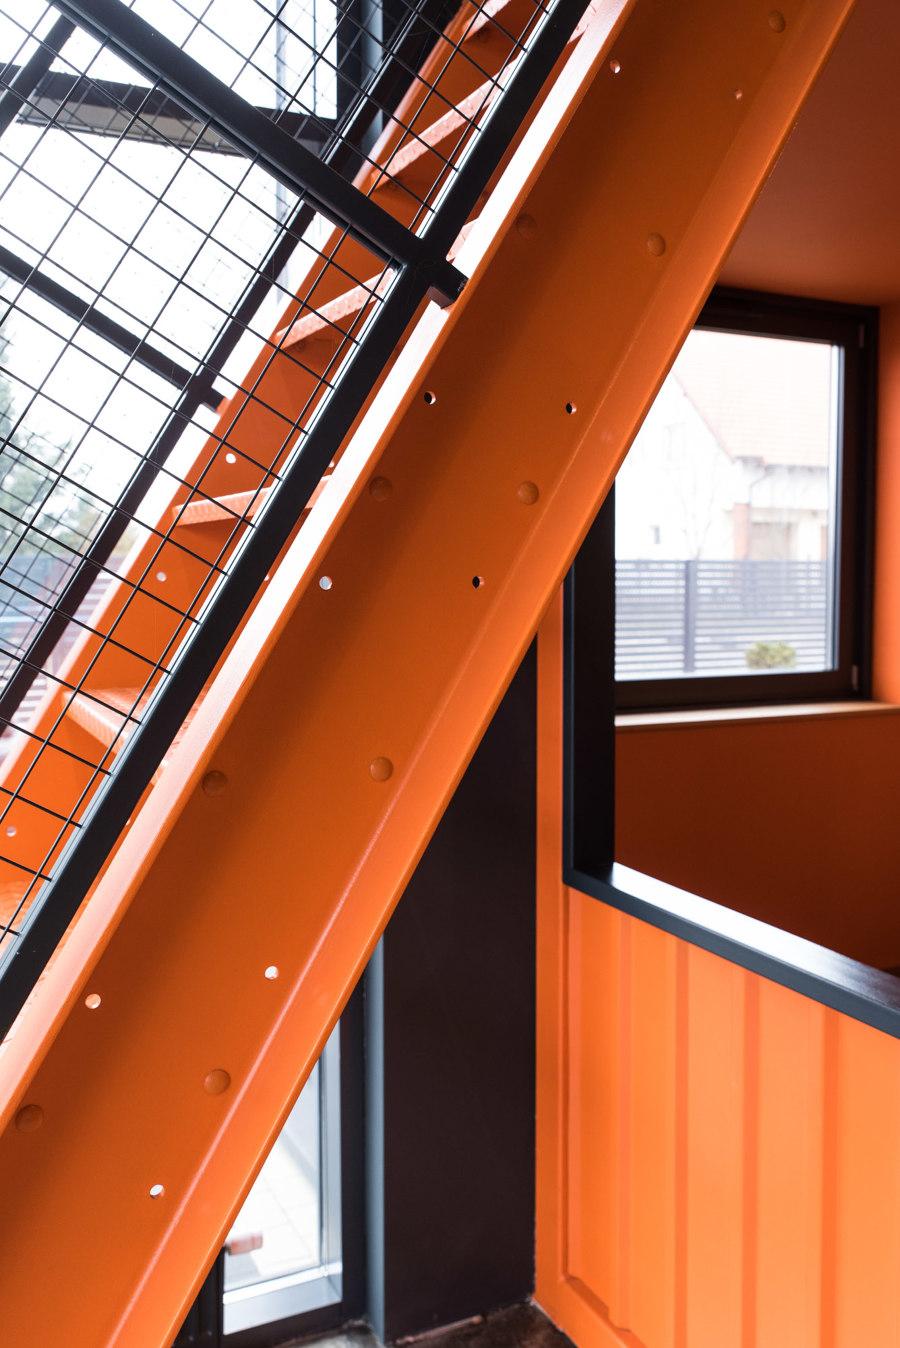 KOHMLAN Office by mode:lina architekci   Office facilities